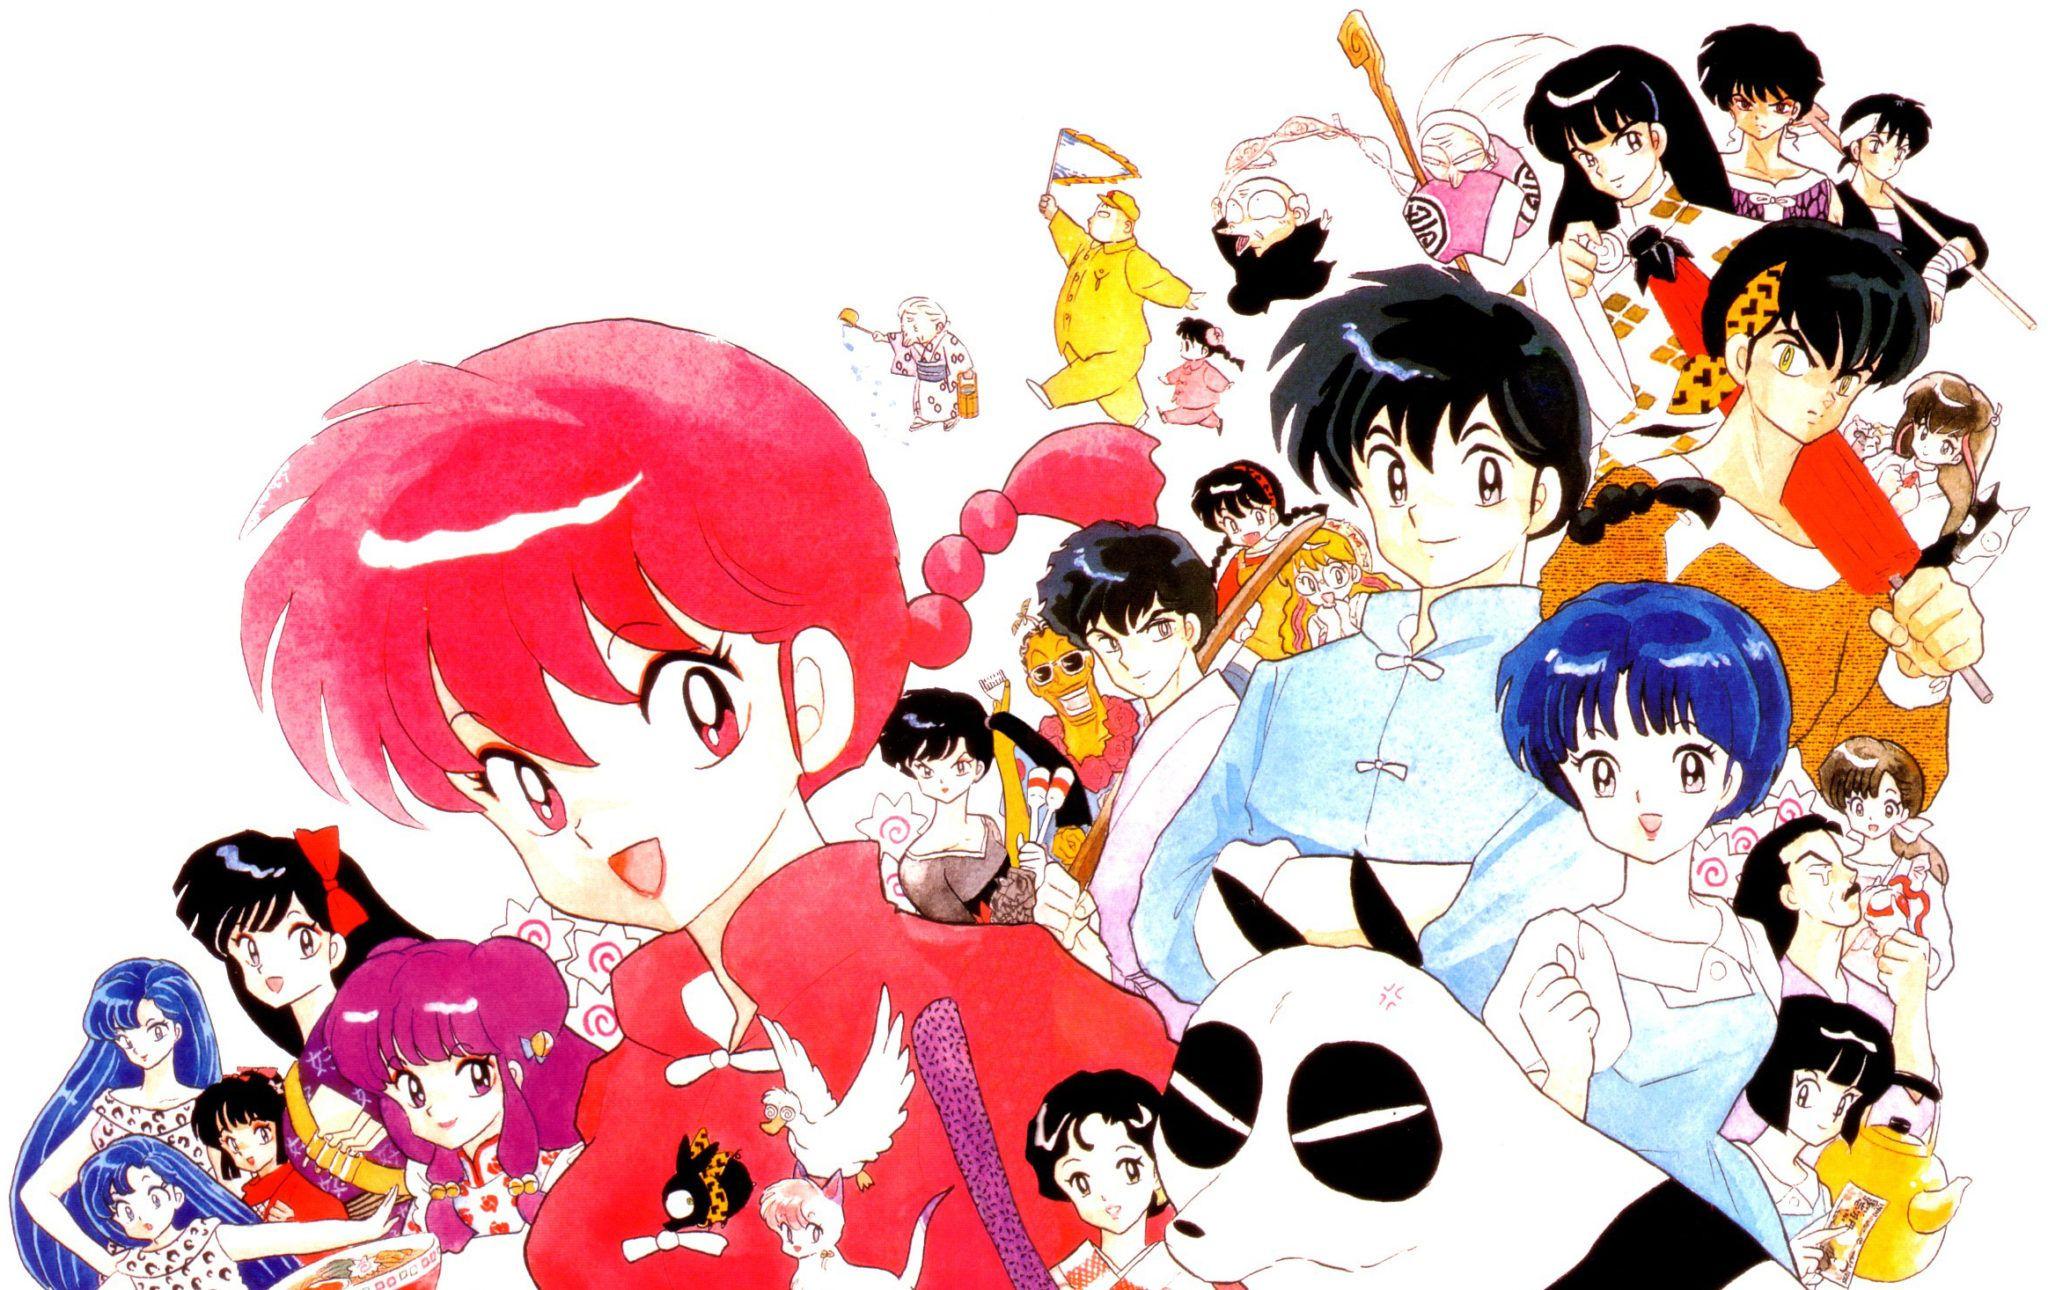 Ranma 1 2 Anime Characters : Planeta reeditará el dulce hogar de chi y ranma del